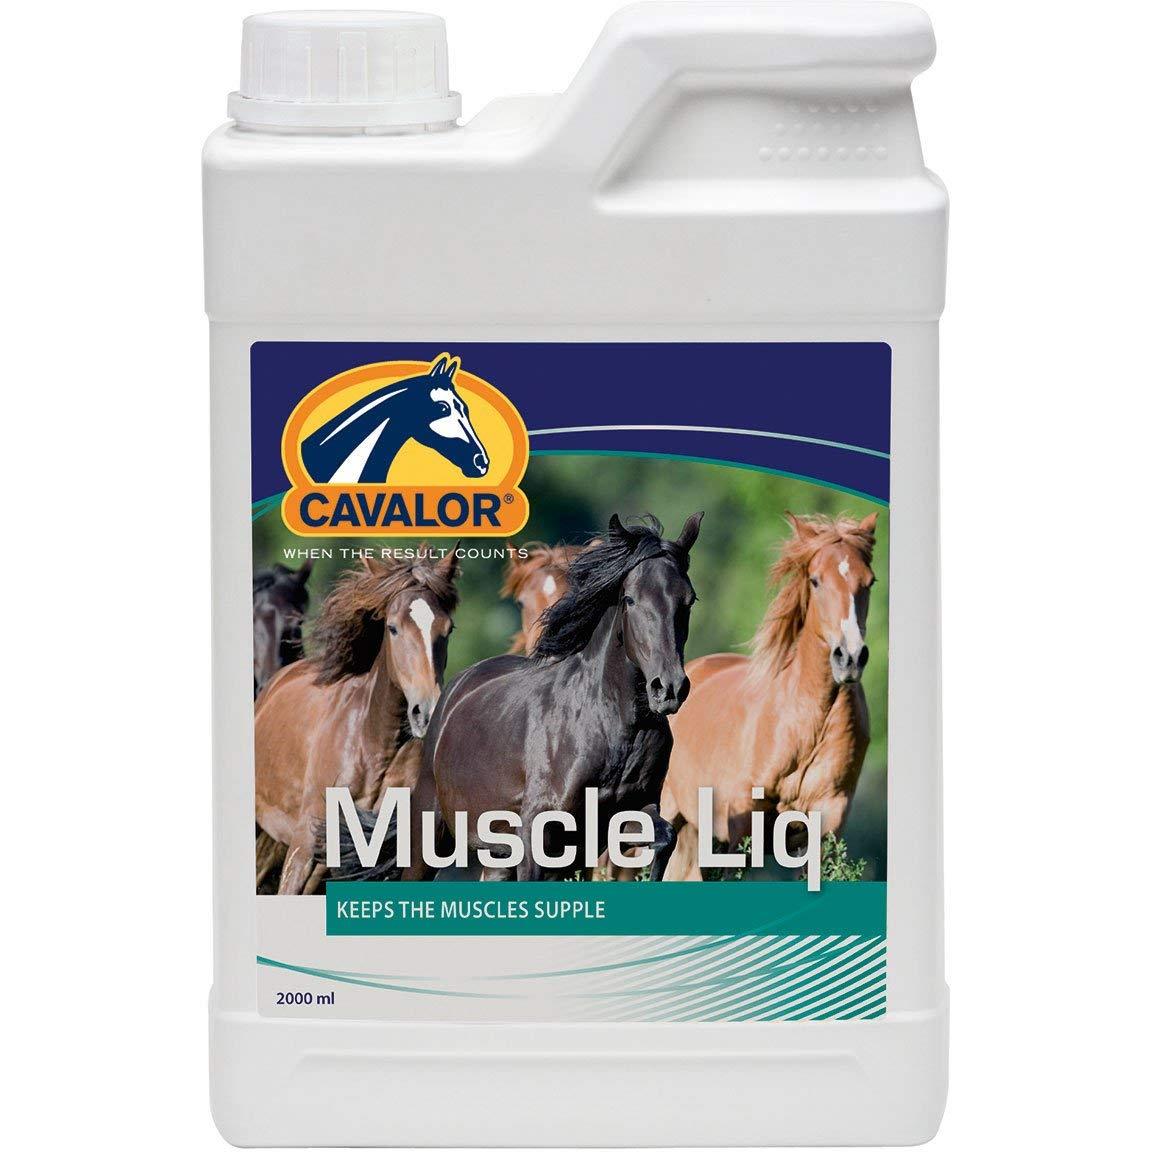 Cavalor Muscle integratore Liq performance